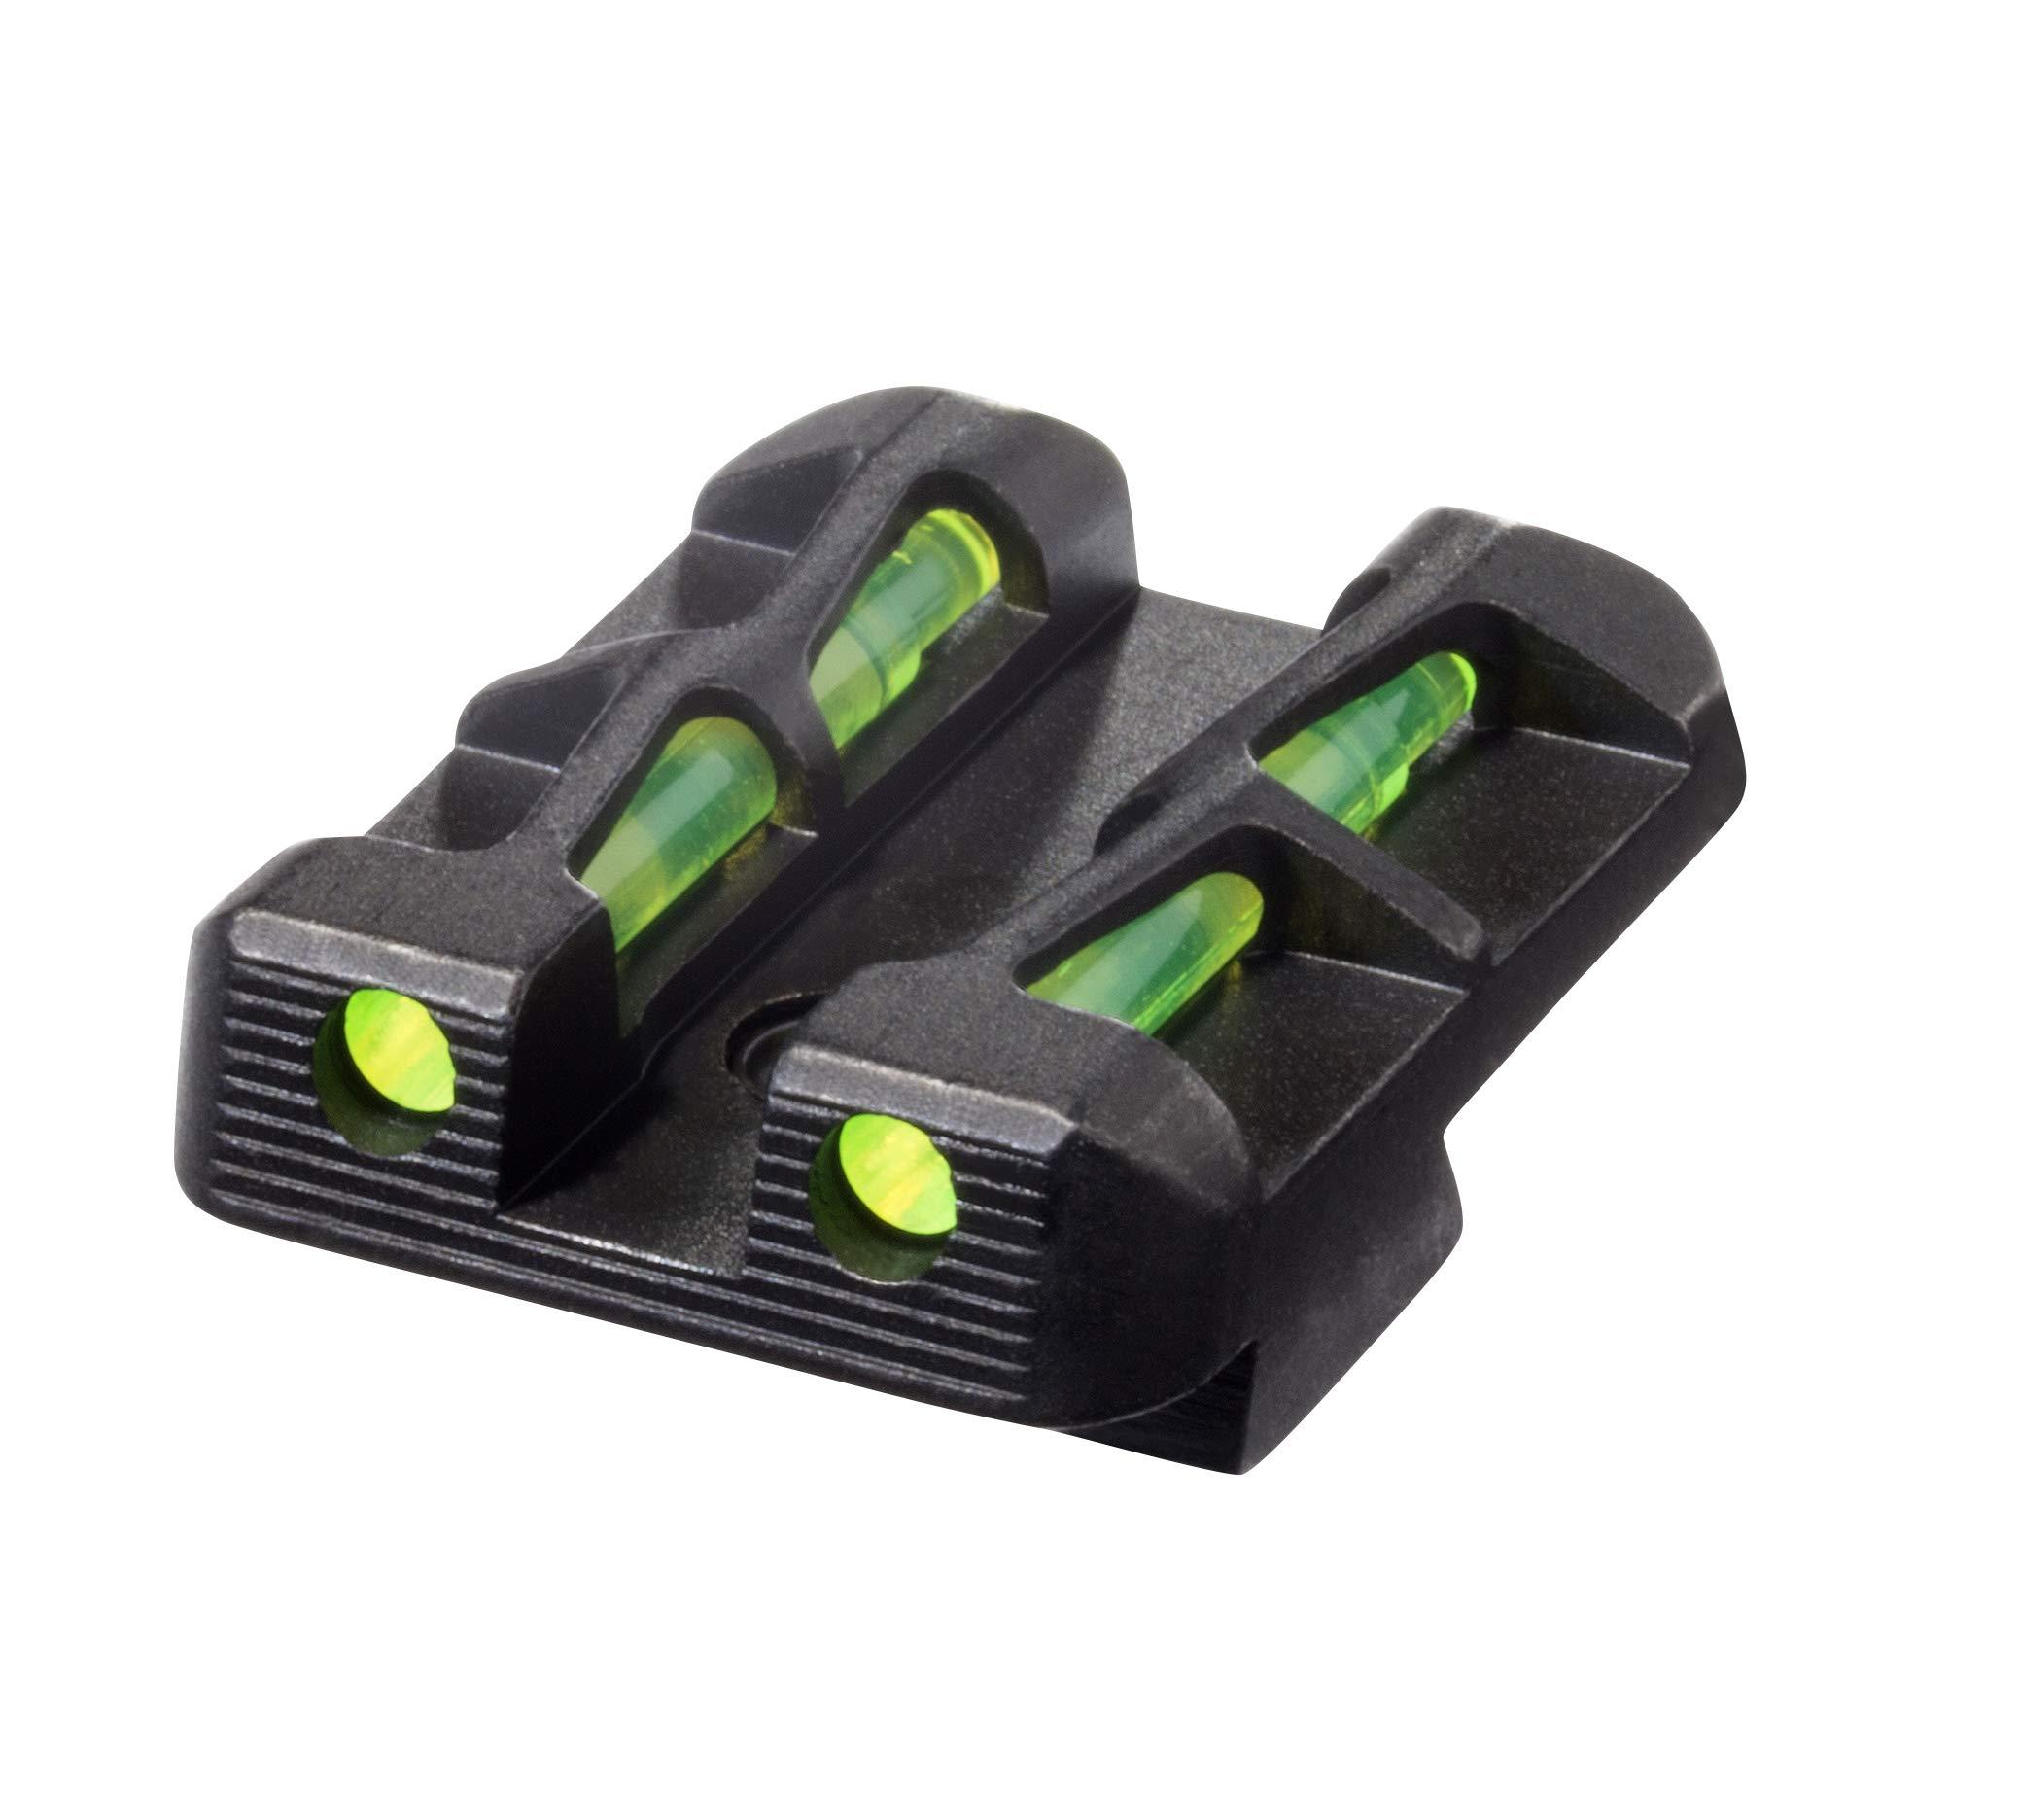 HIVIZ Sight Systems SGLW18, Litewave Rear Sight, Sig Sauer P-Series by HIVIZ Sight Systems